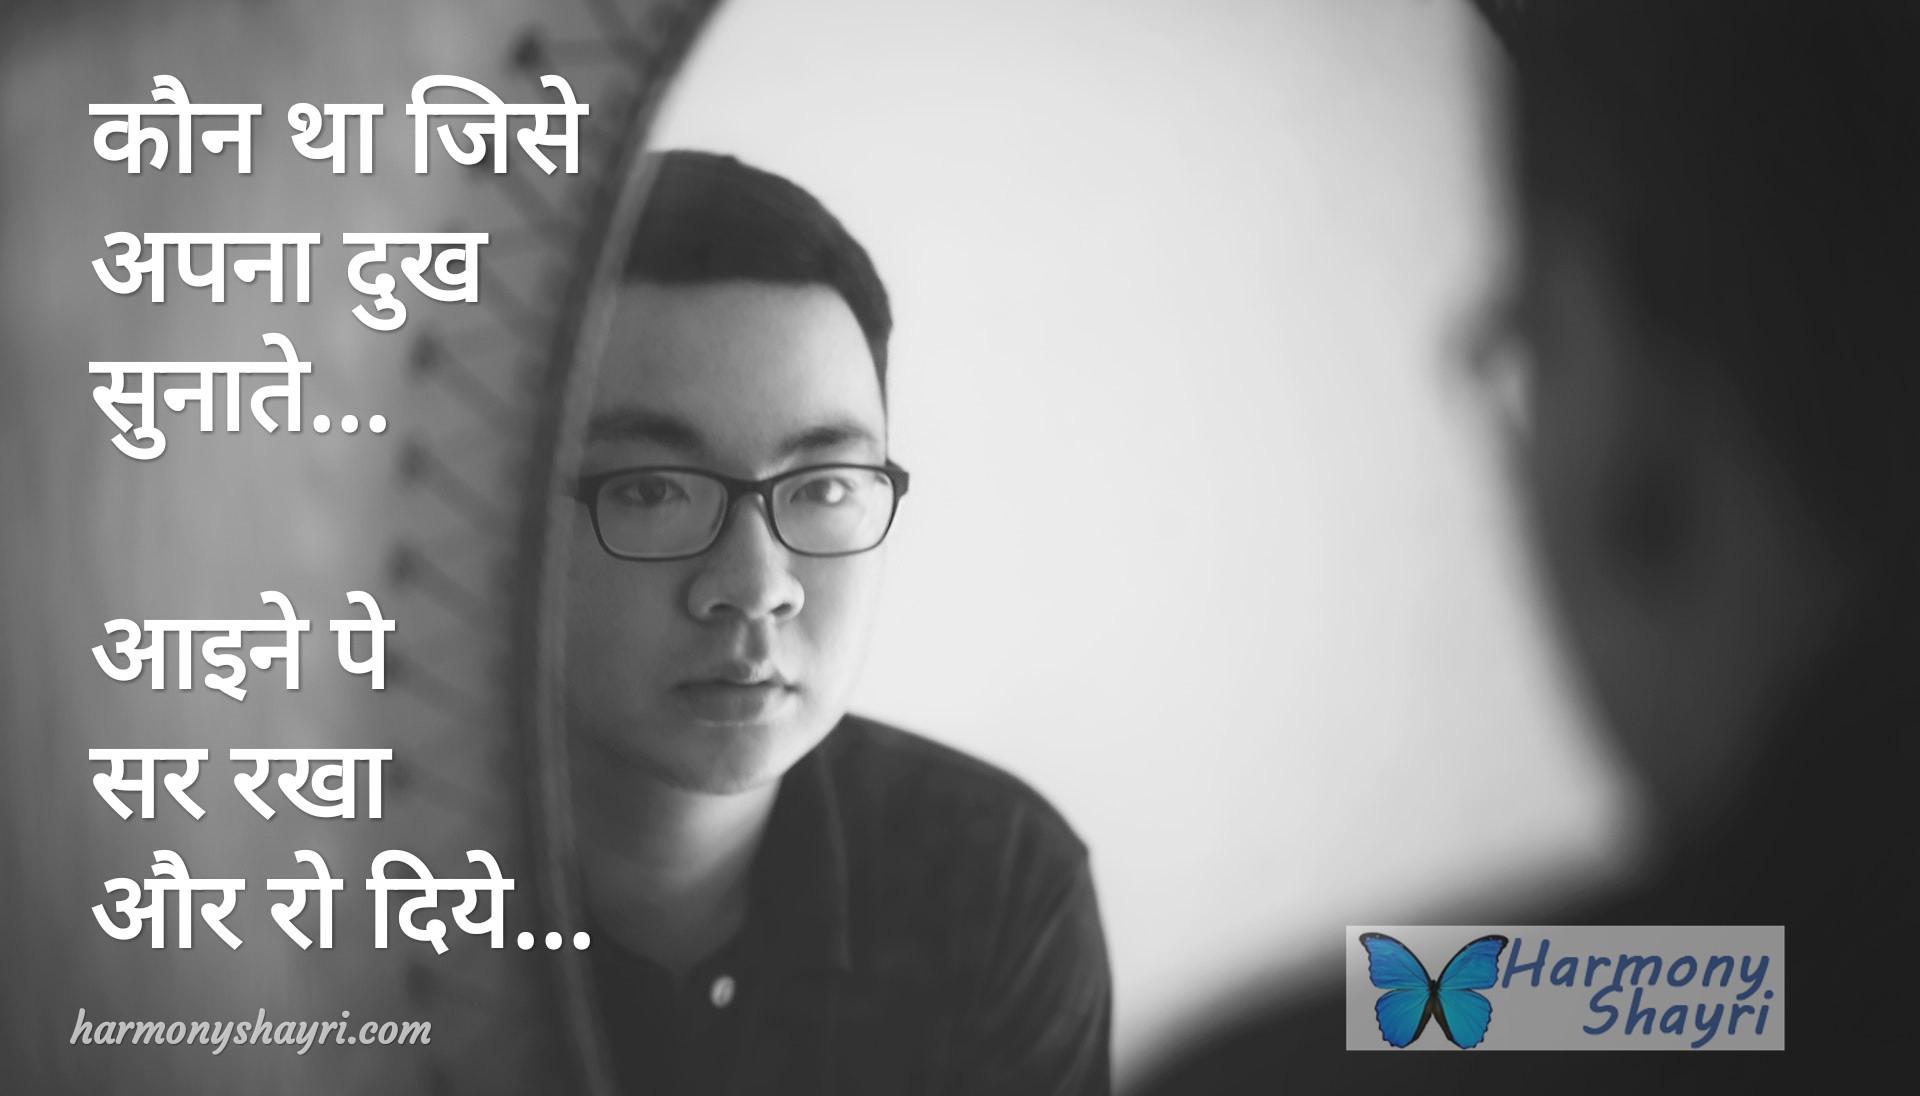 kaun tha jise top hindi shayari collection famous hindi shayari